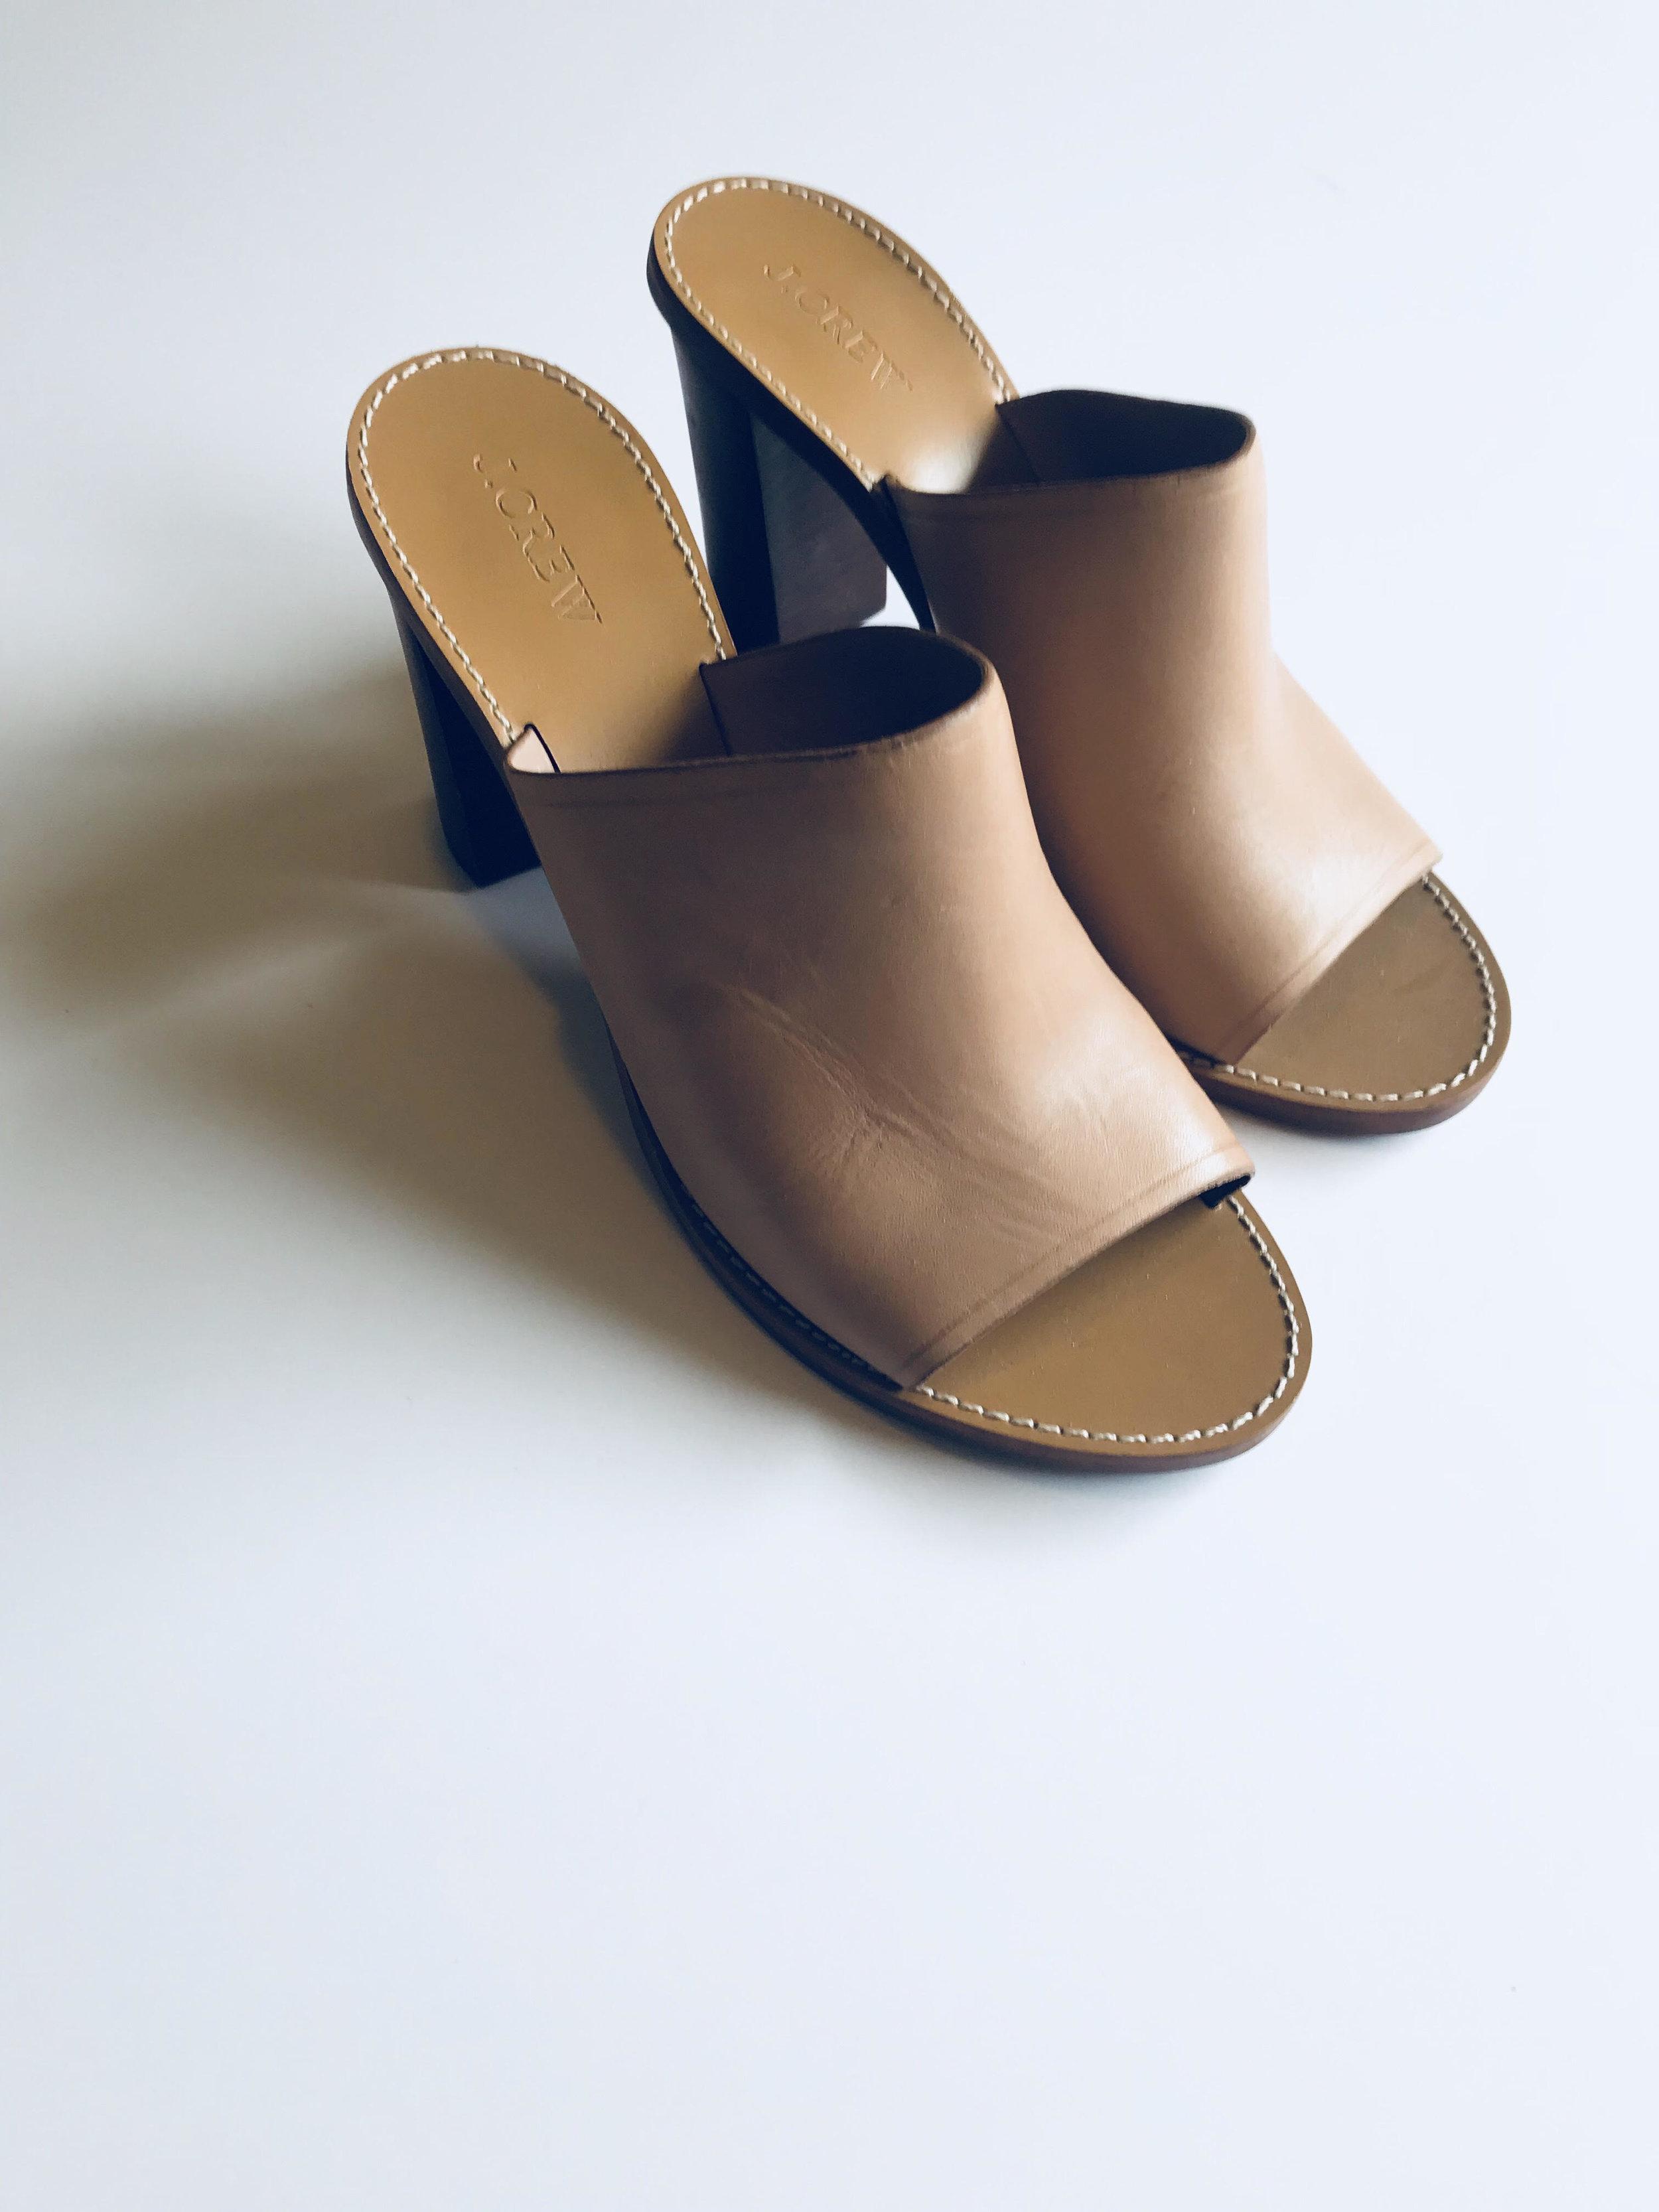 3. Block Heel Mules - Price: $17Brand: J. CREW